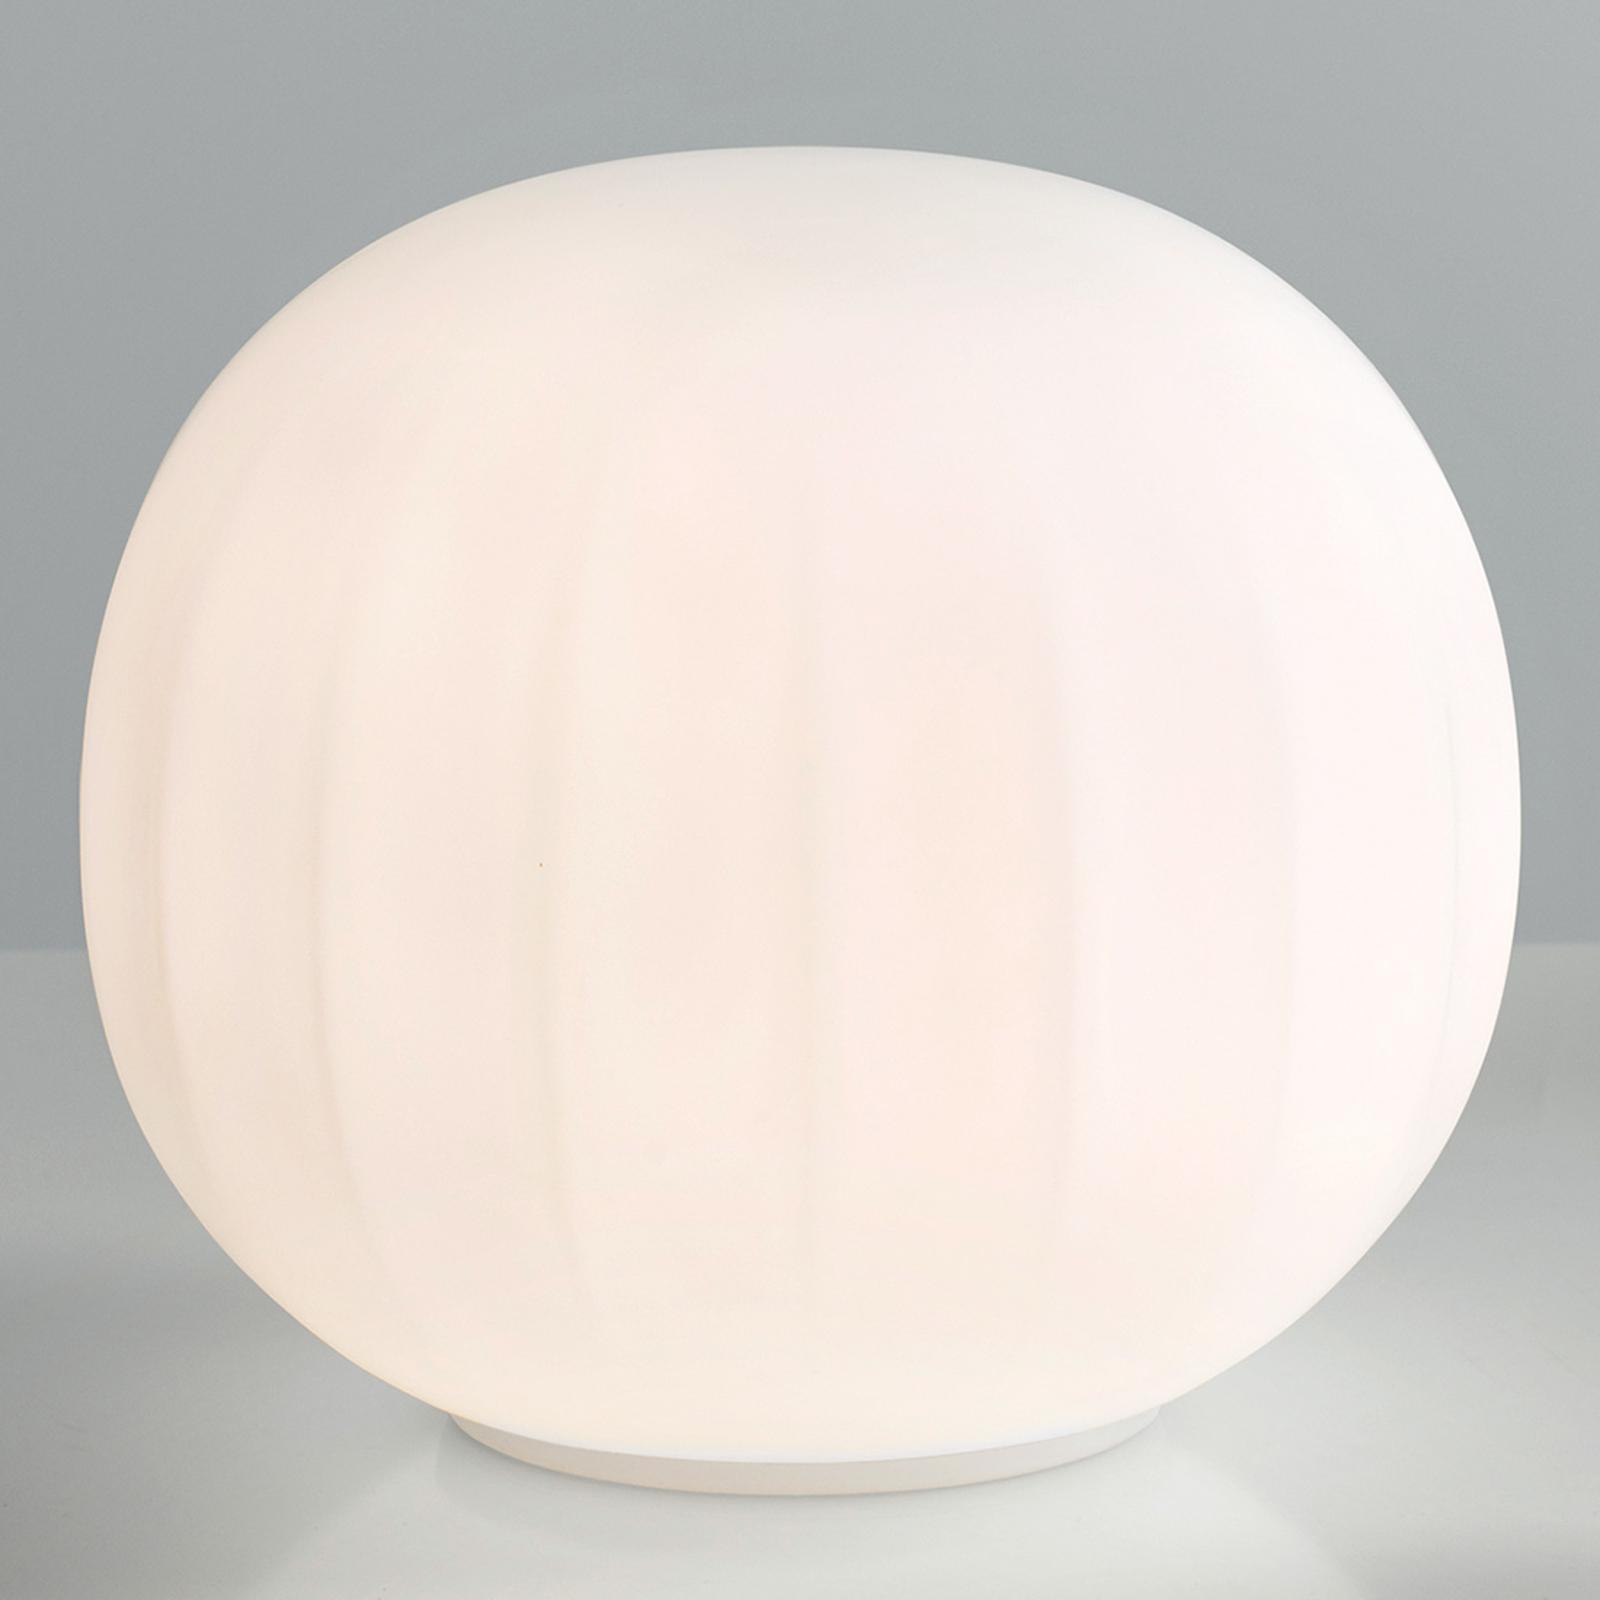 Luceplan Lita lampe à poser Ø 30 cm